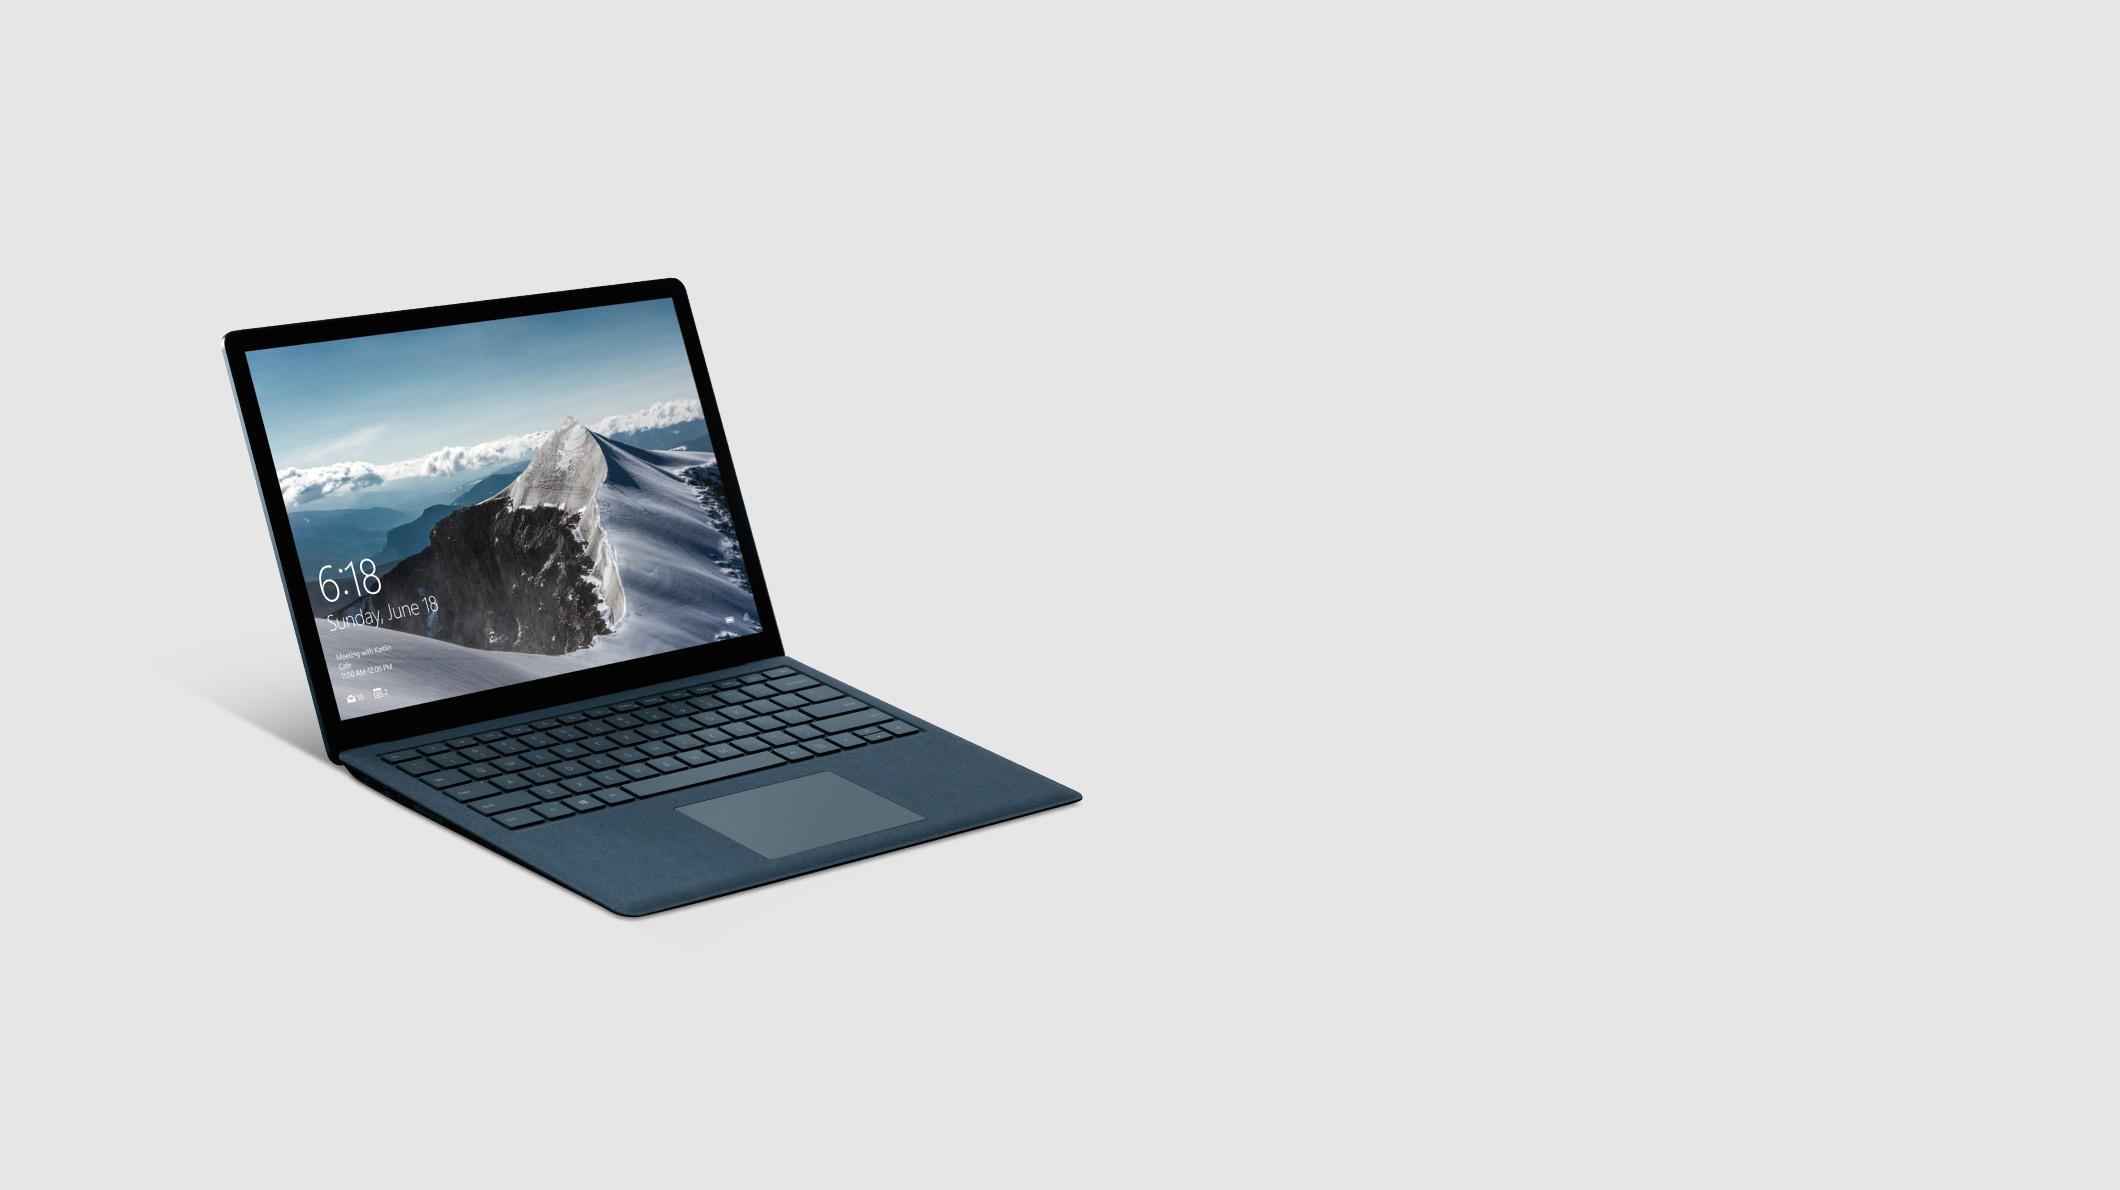 A Surface Laptop